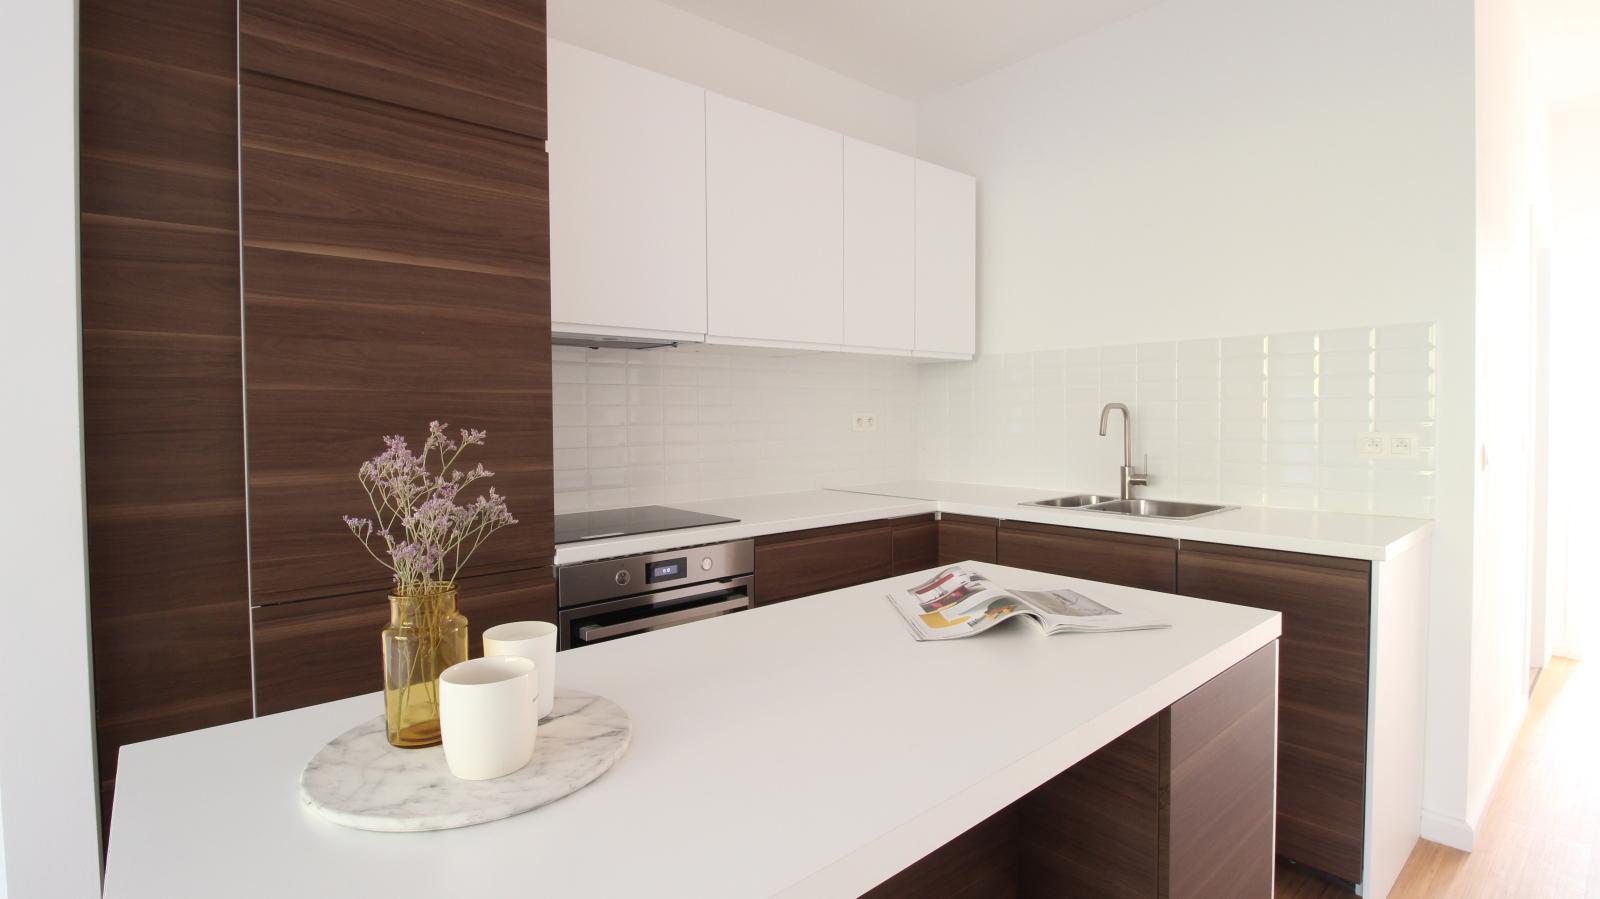 Gerenoveerd appartement met twee slaapkamers op centrale ligging te Mortsel! afbeelding 2